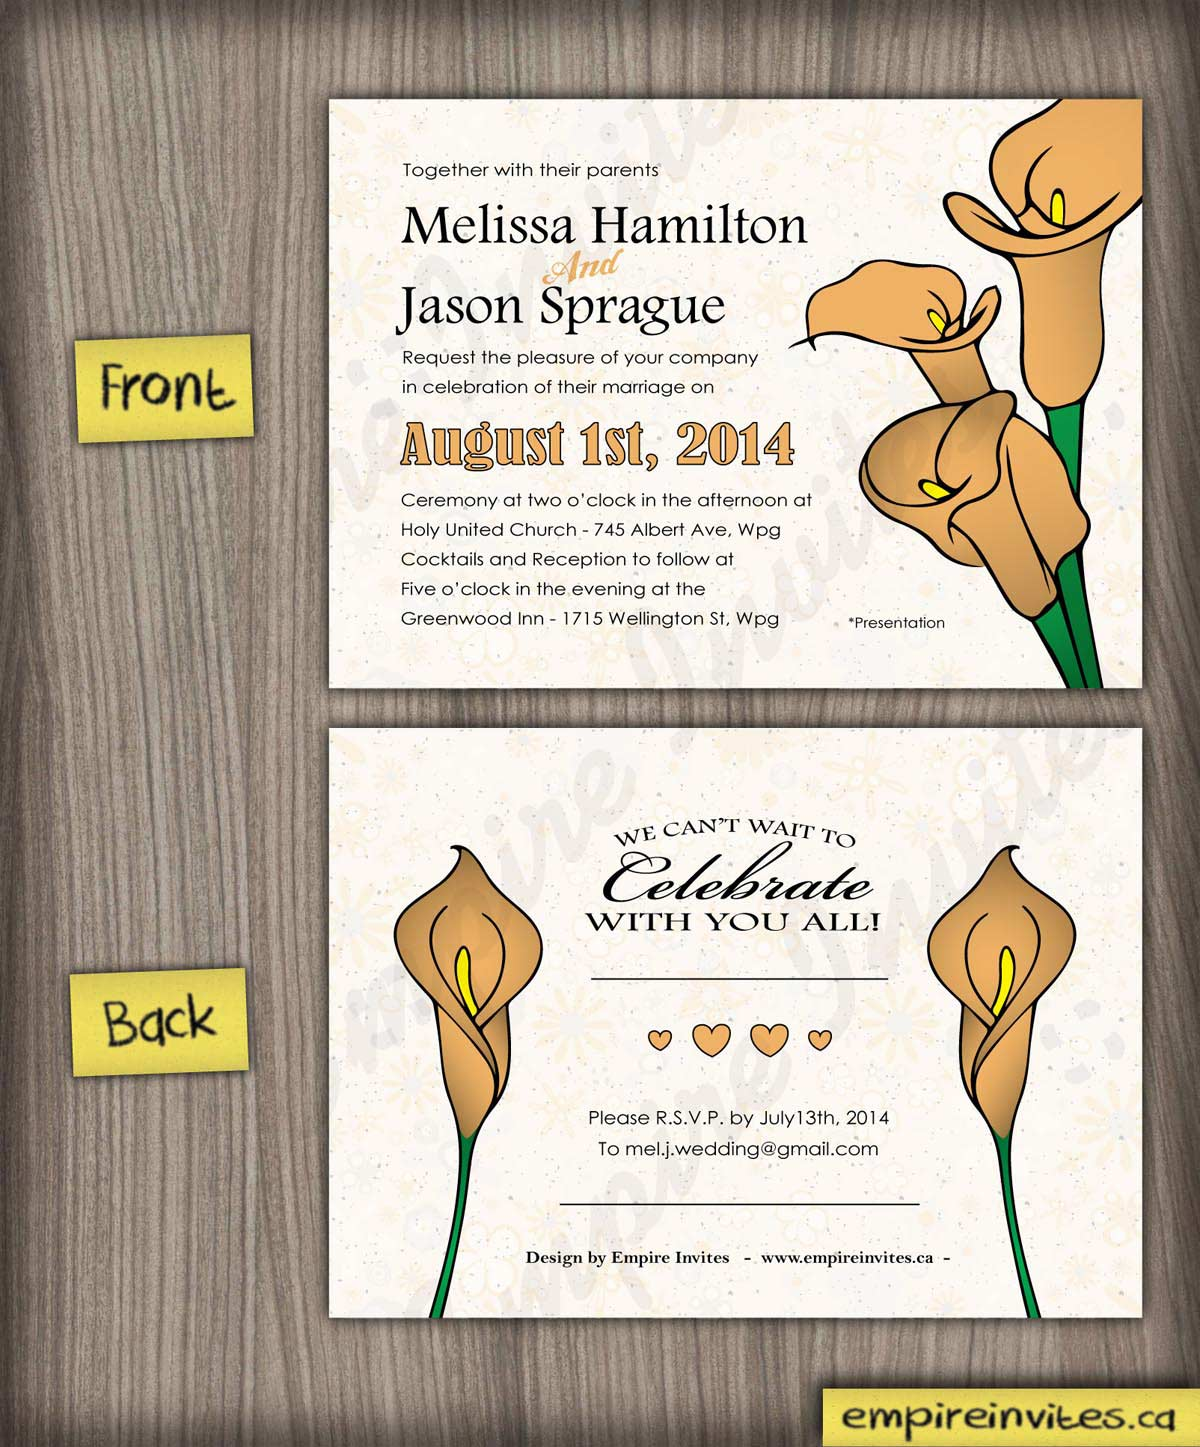 General Wedding Invite 26 | ---- EMPIRE INVITES ---- Winnipeg ...